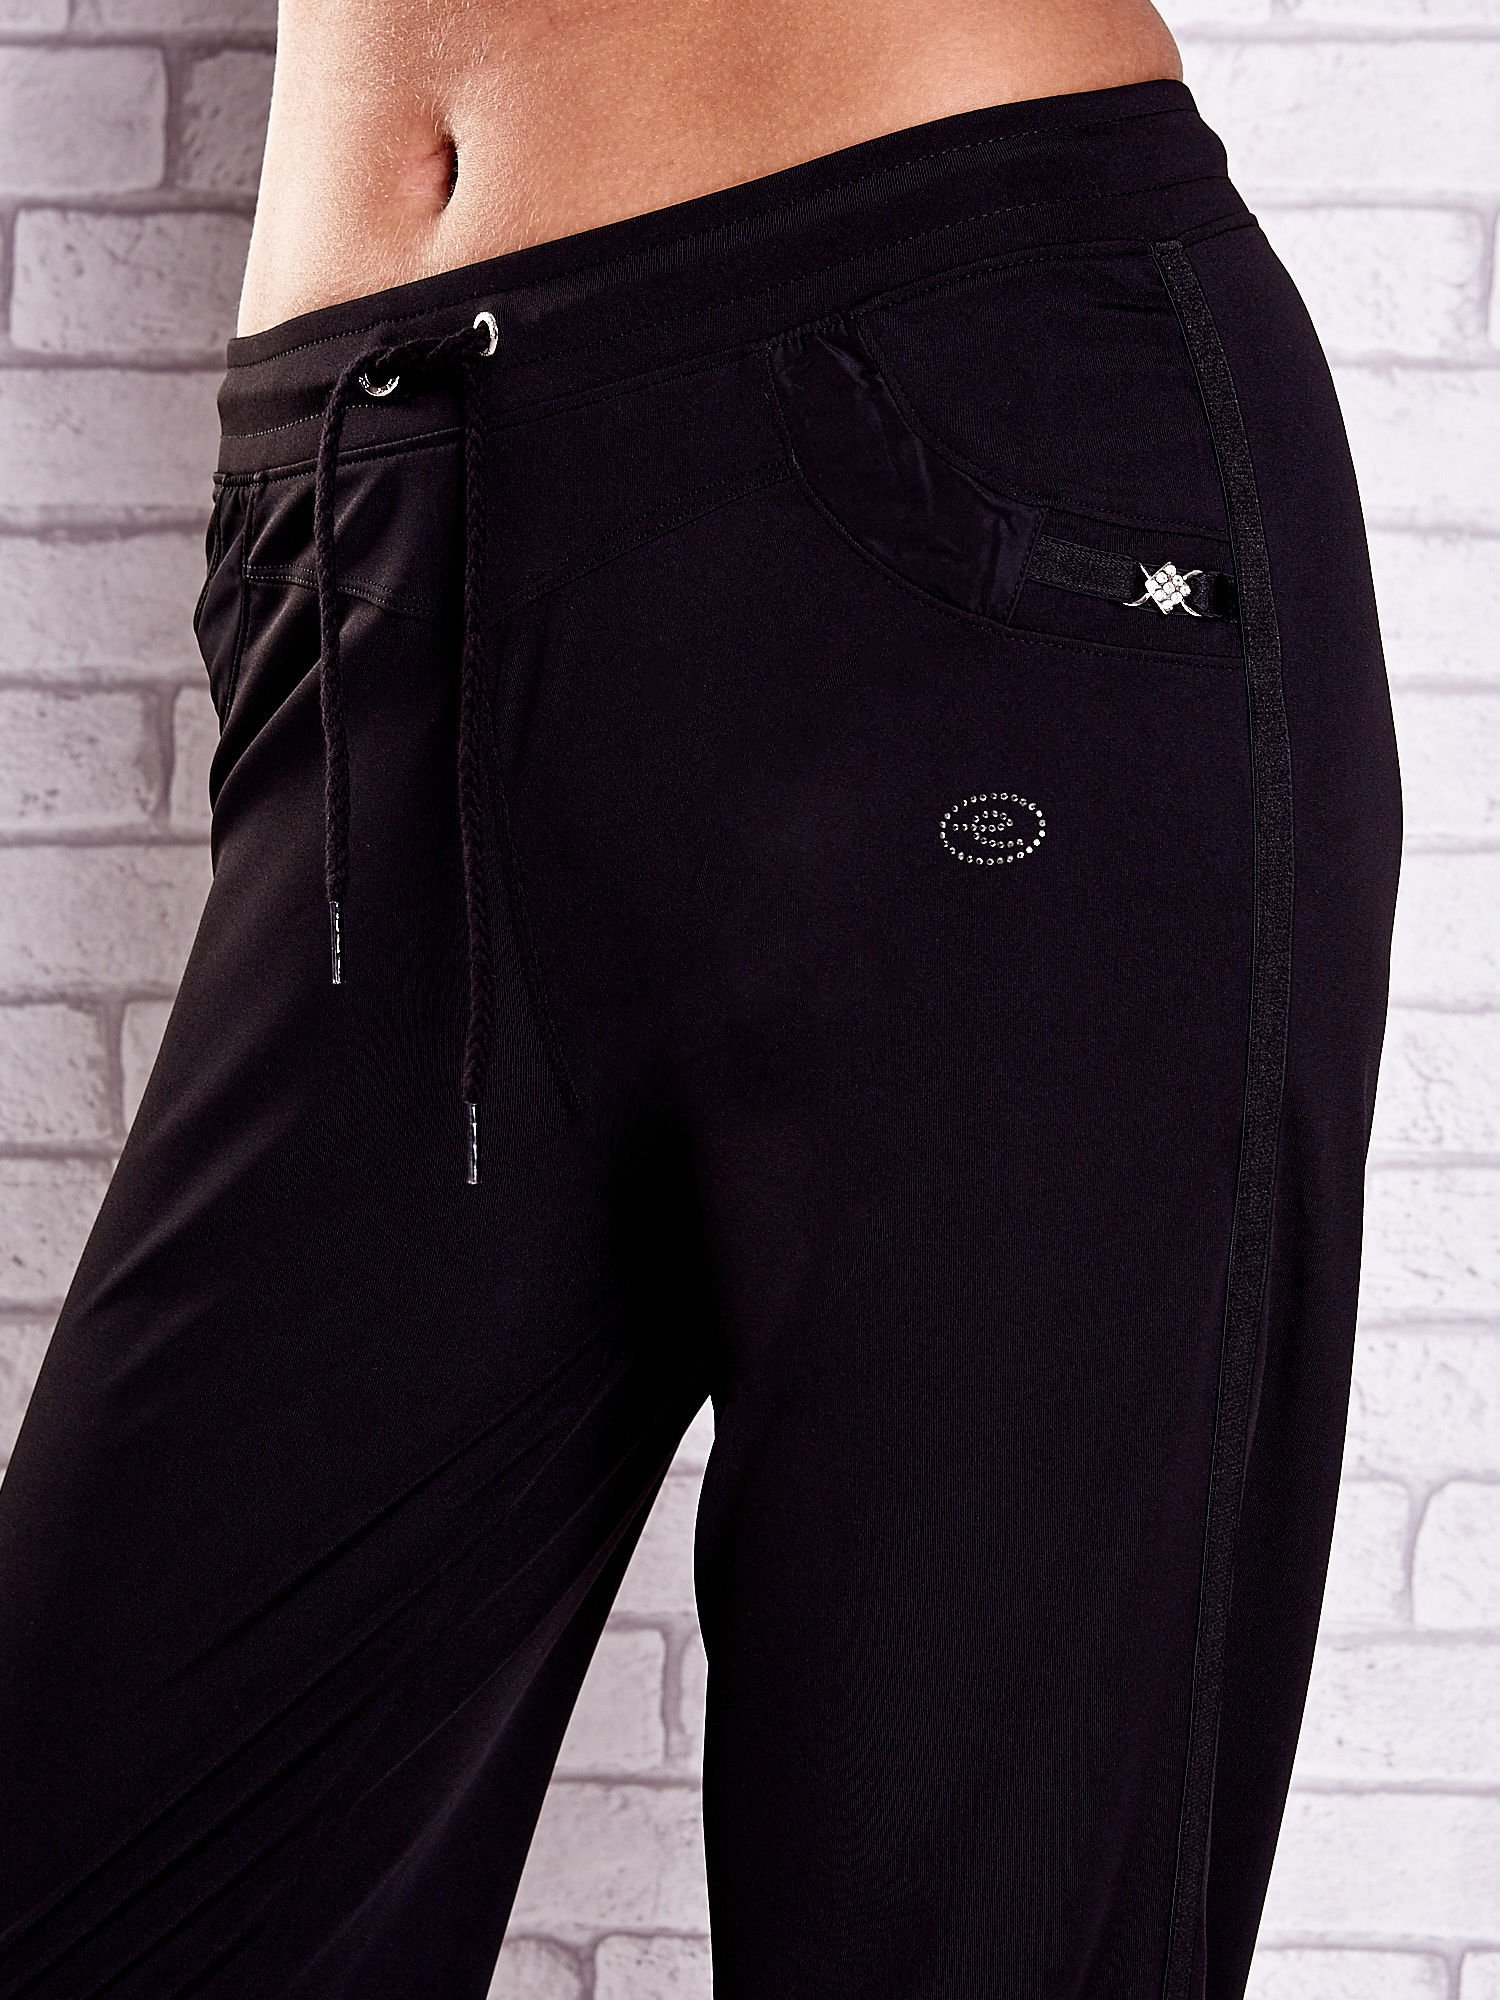 Czarne spodnie capri z dżetami i lampasami PLUS SIZE                                  zdj.                                  4